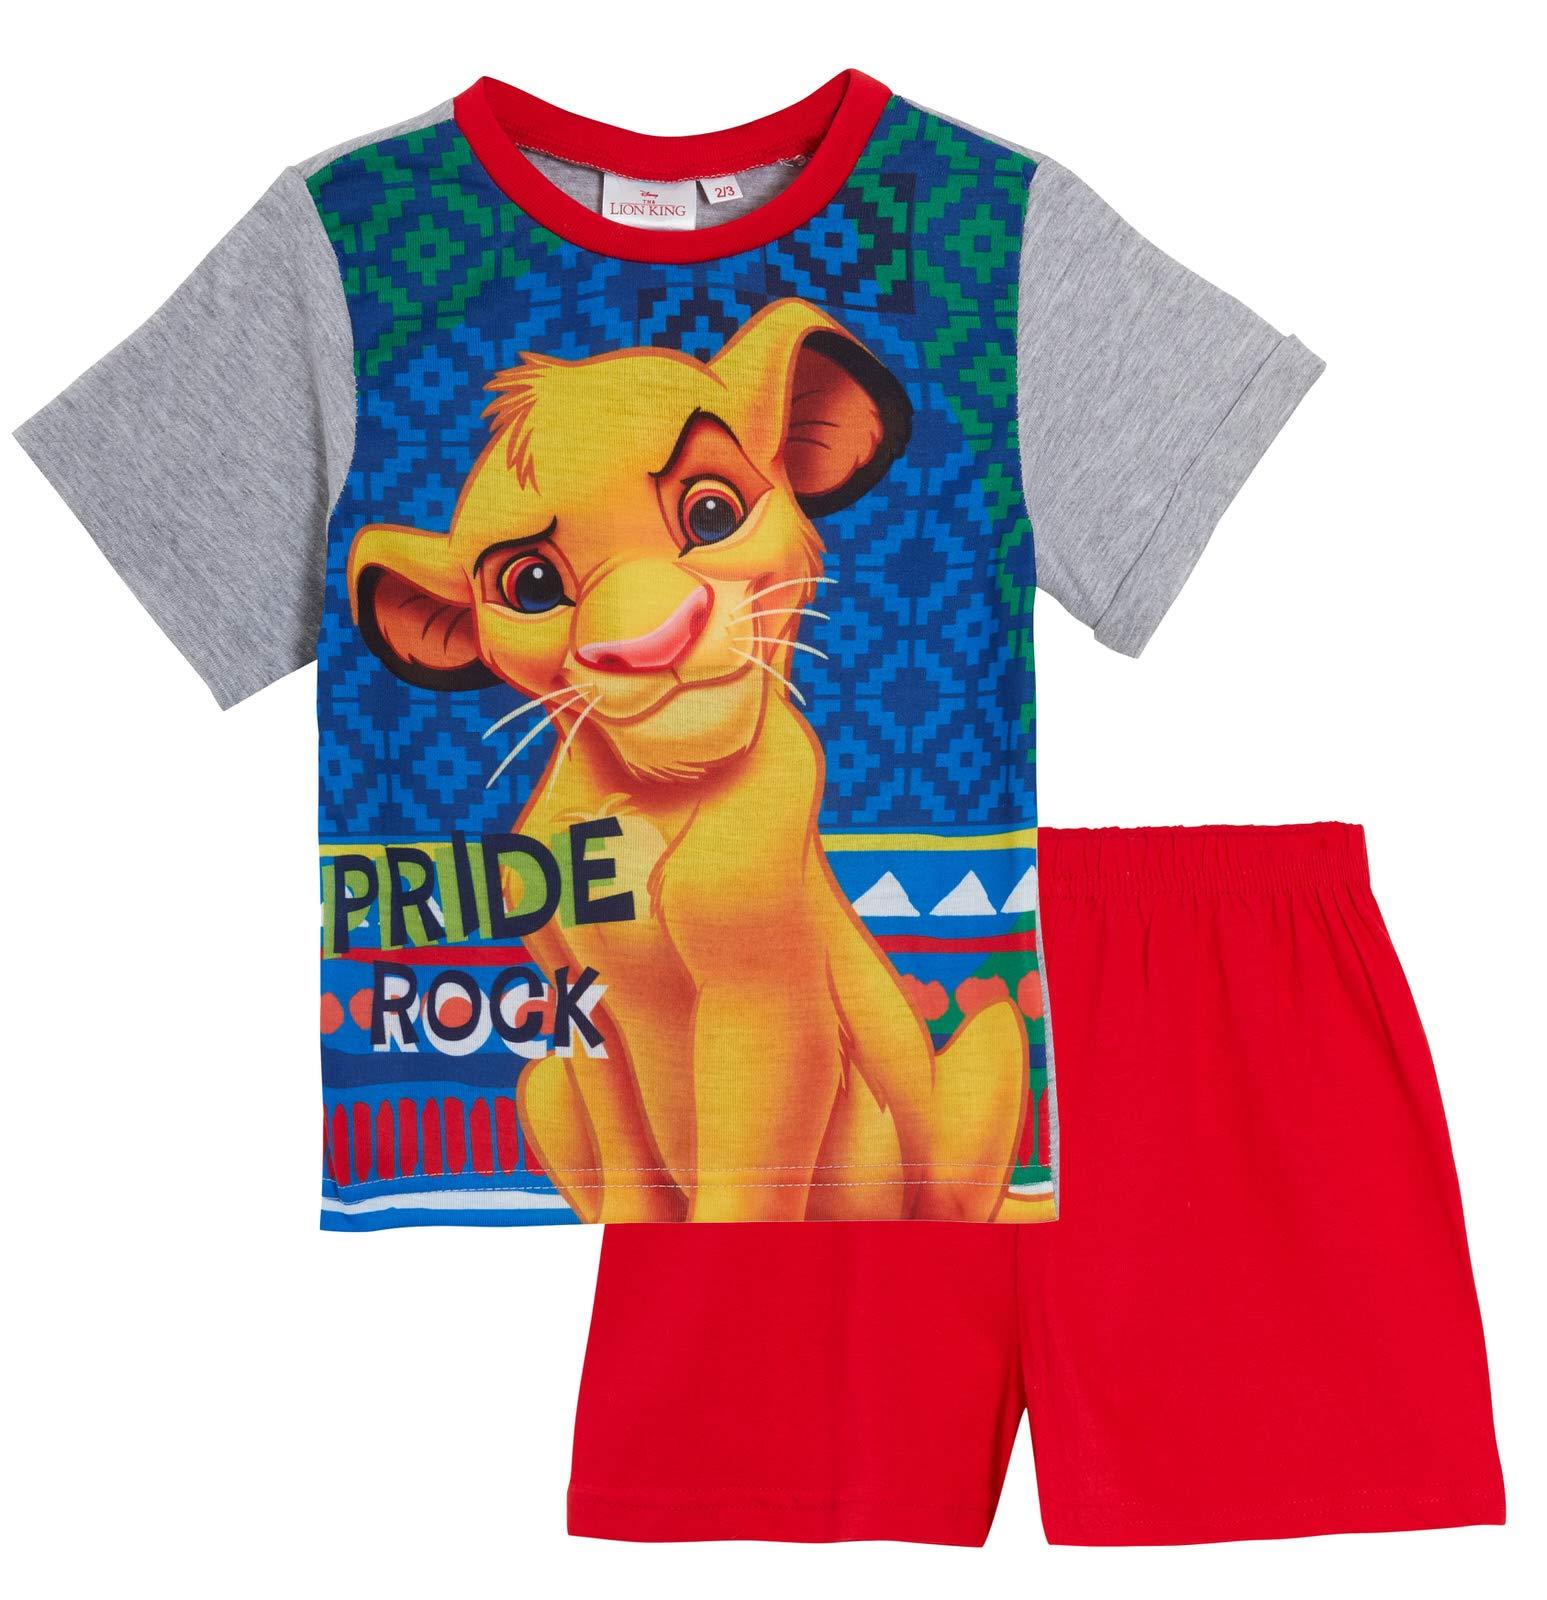 NEW Boys  Cotton Official Boys Lion king Shortie Pyjamas  set 1-5 Years